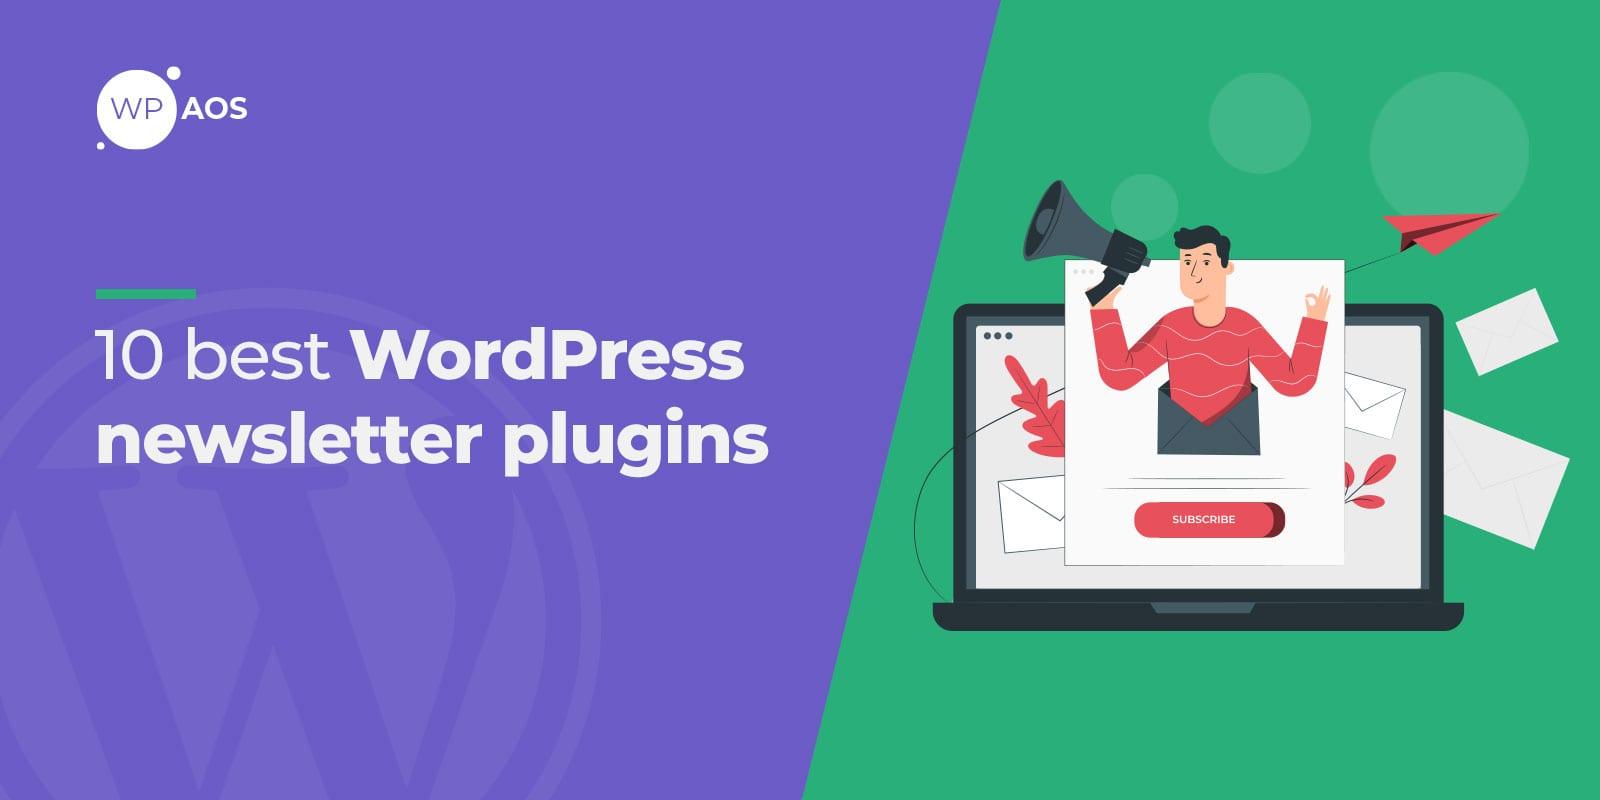 wordpress newsletter plugin, subscription, wpaos